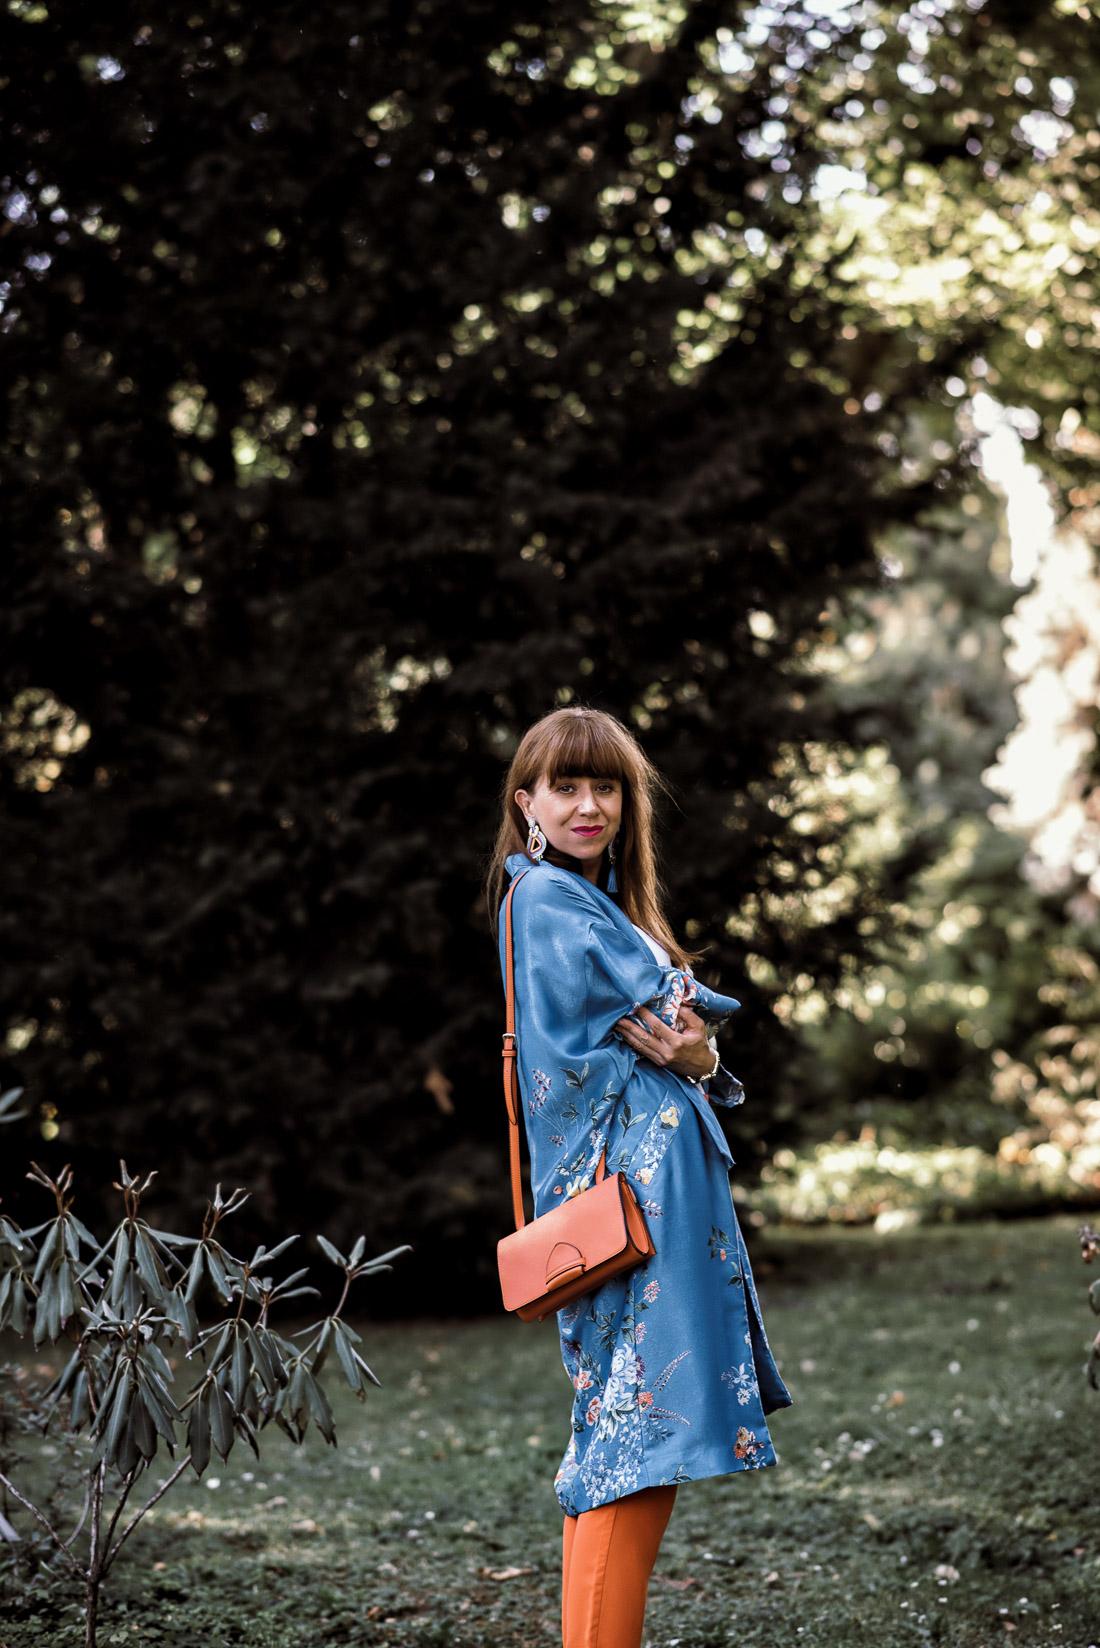 NOVÝ BYT, NOVÉ MOŽNOSTI_Katharine-fashion is beautiful_blog 13_Náušnice Bazu_Kvetinové kimono ZARA_Katarína Jakubčová_fashion blogerka